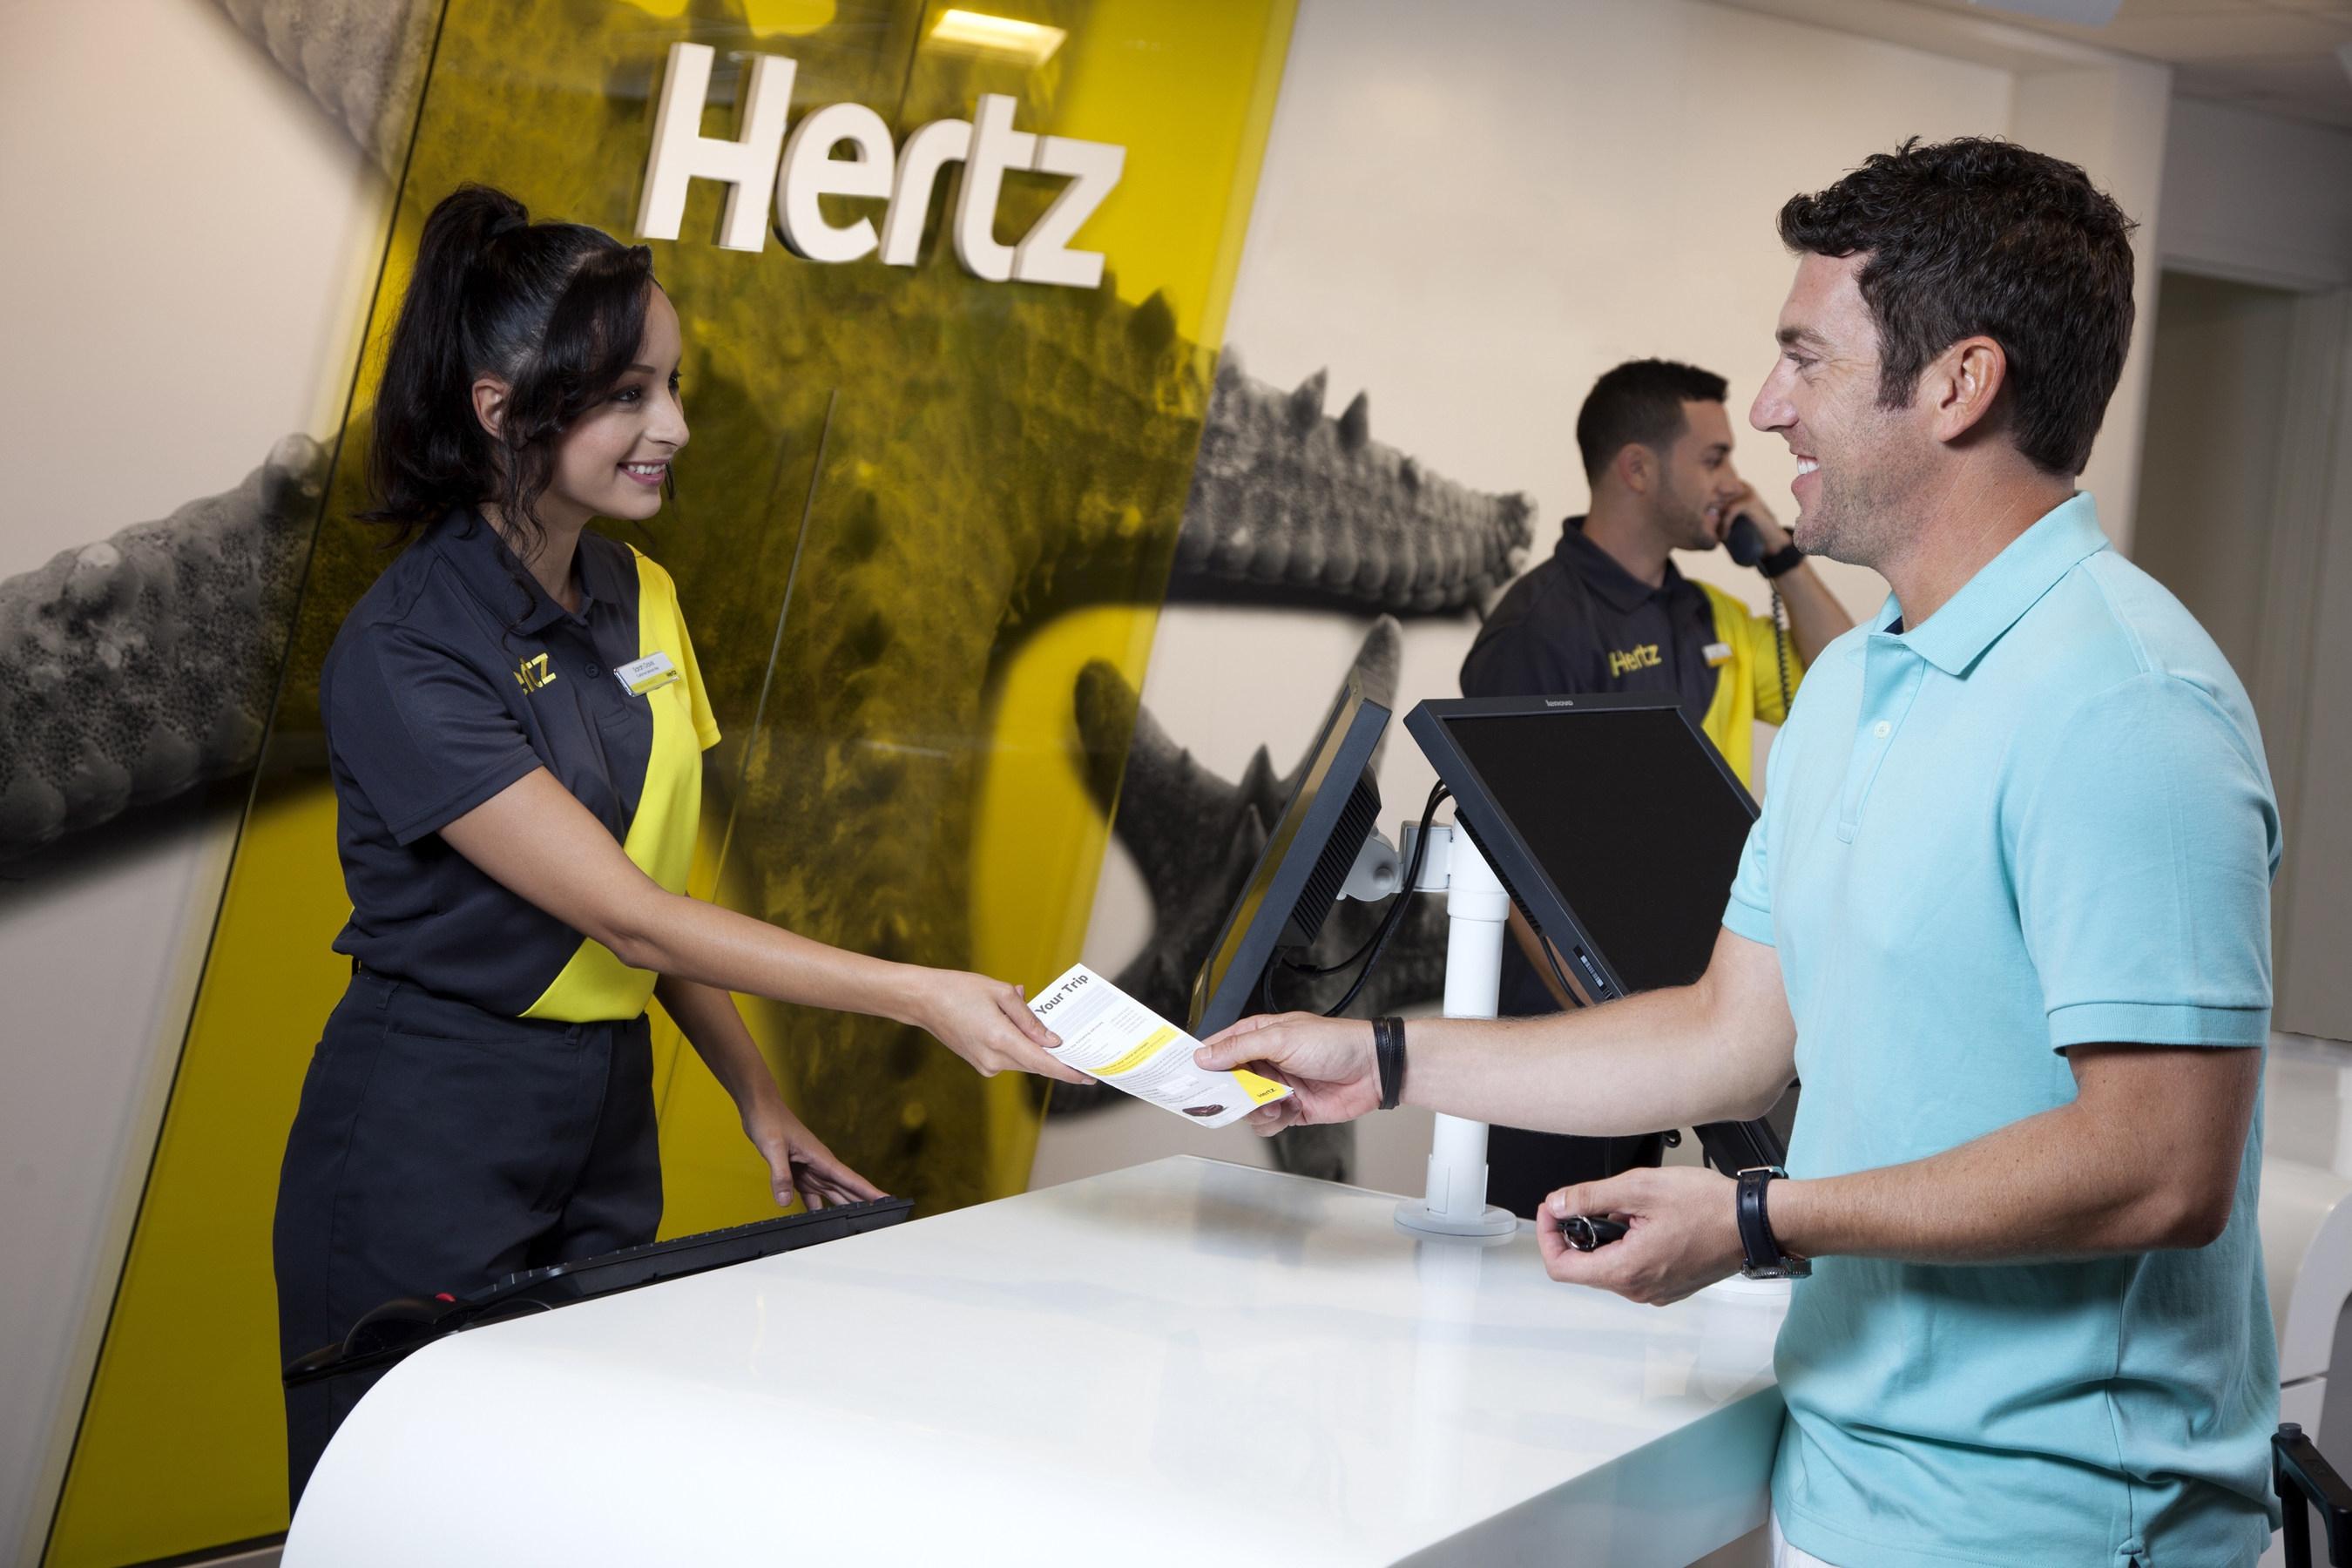 Hertz counter with employee handing rental agreement to customer.